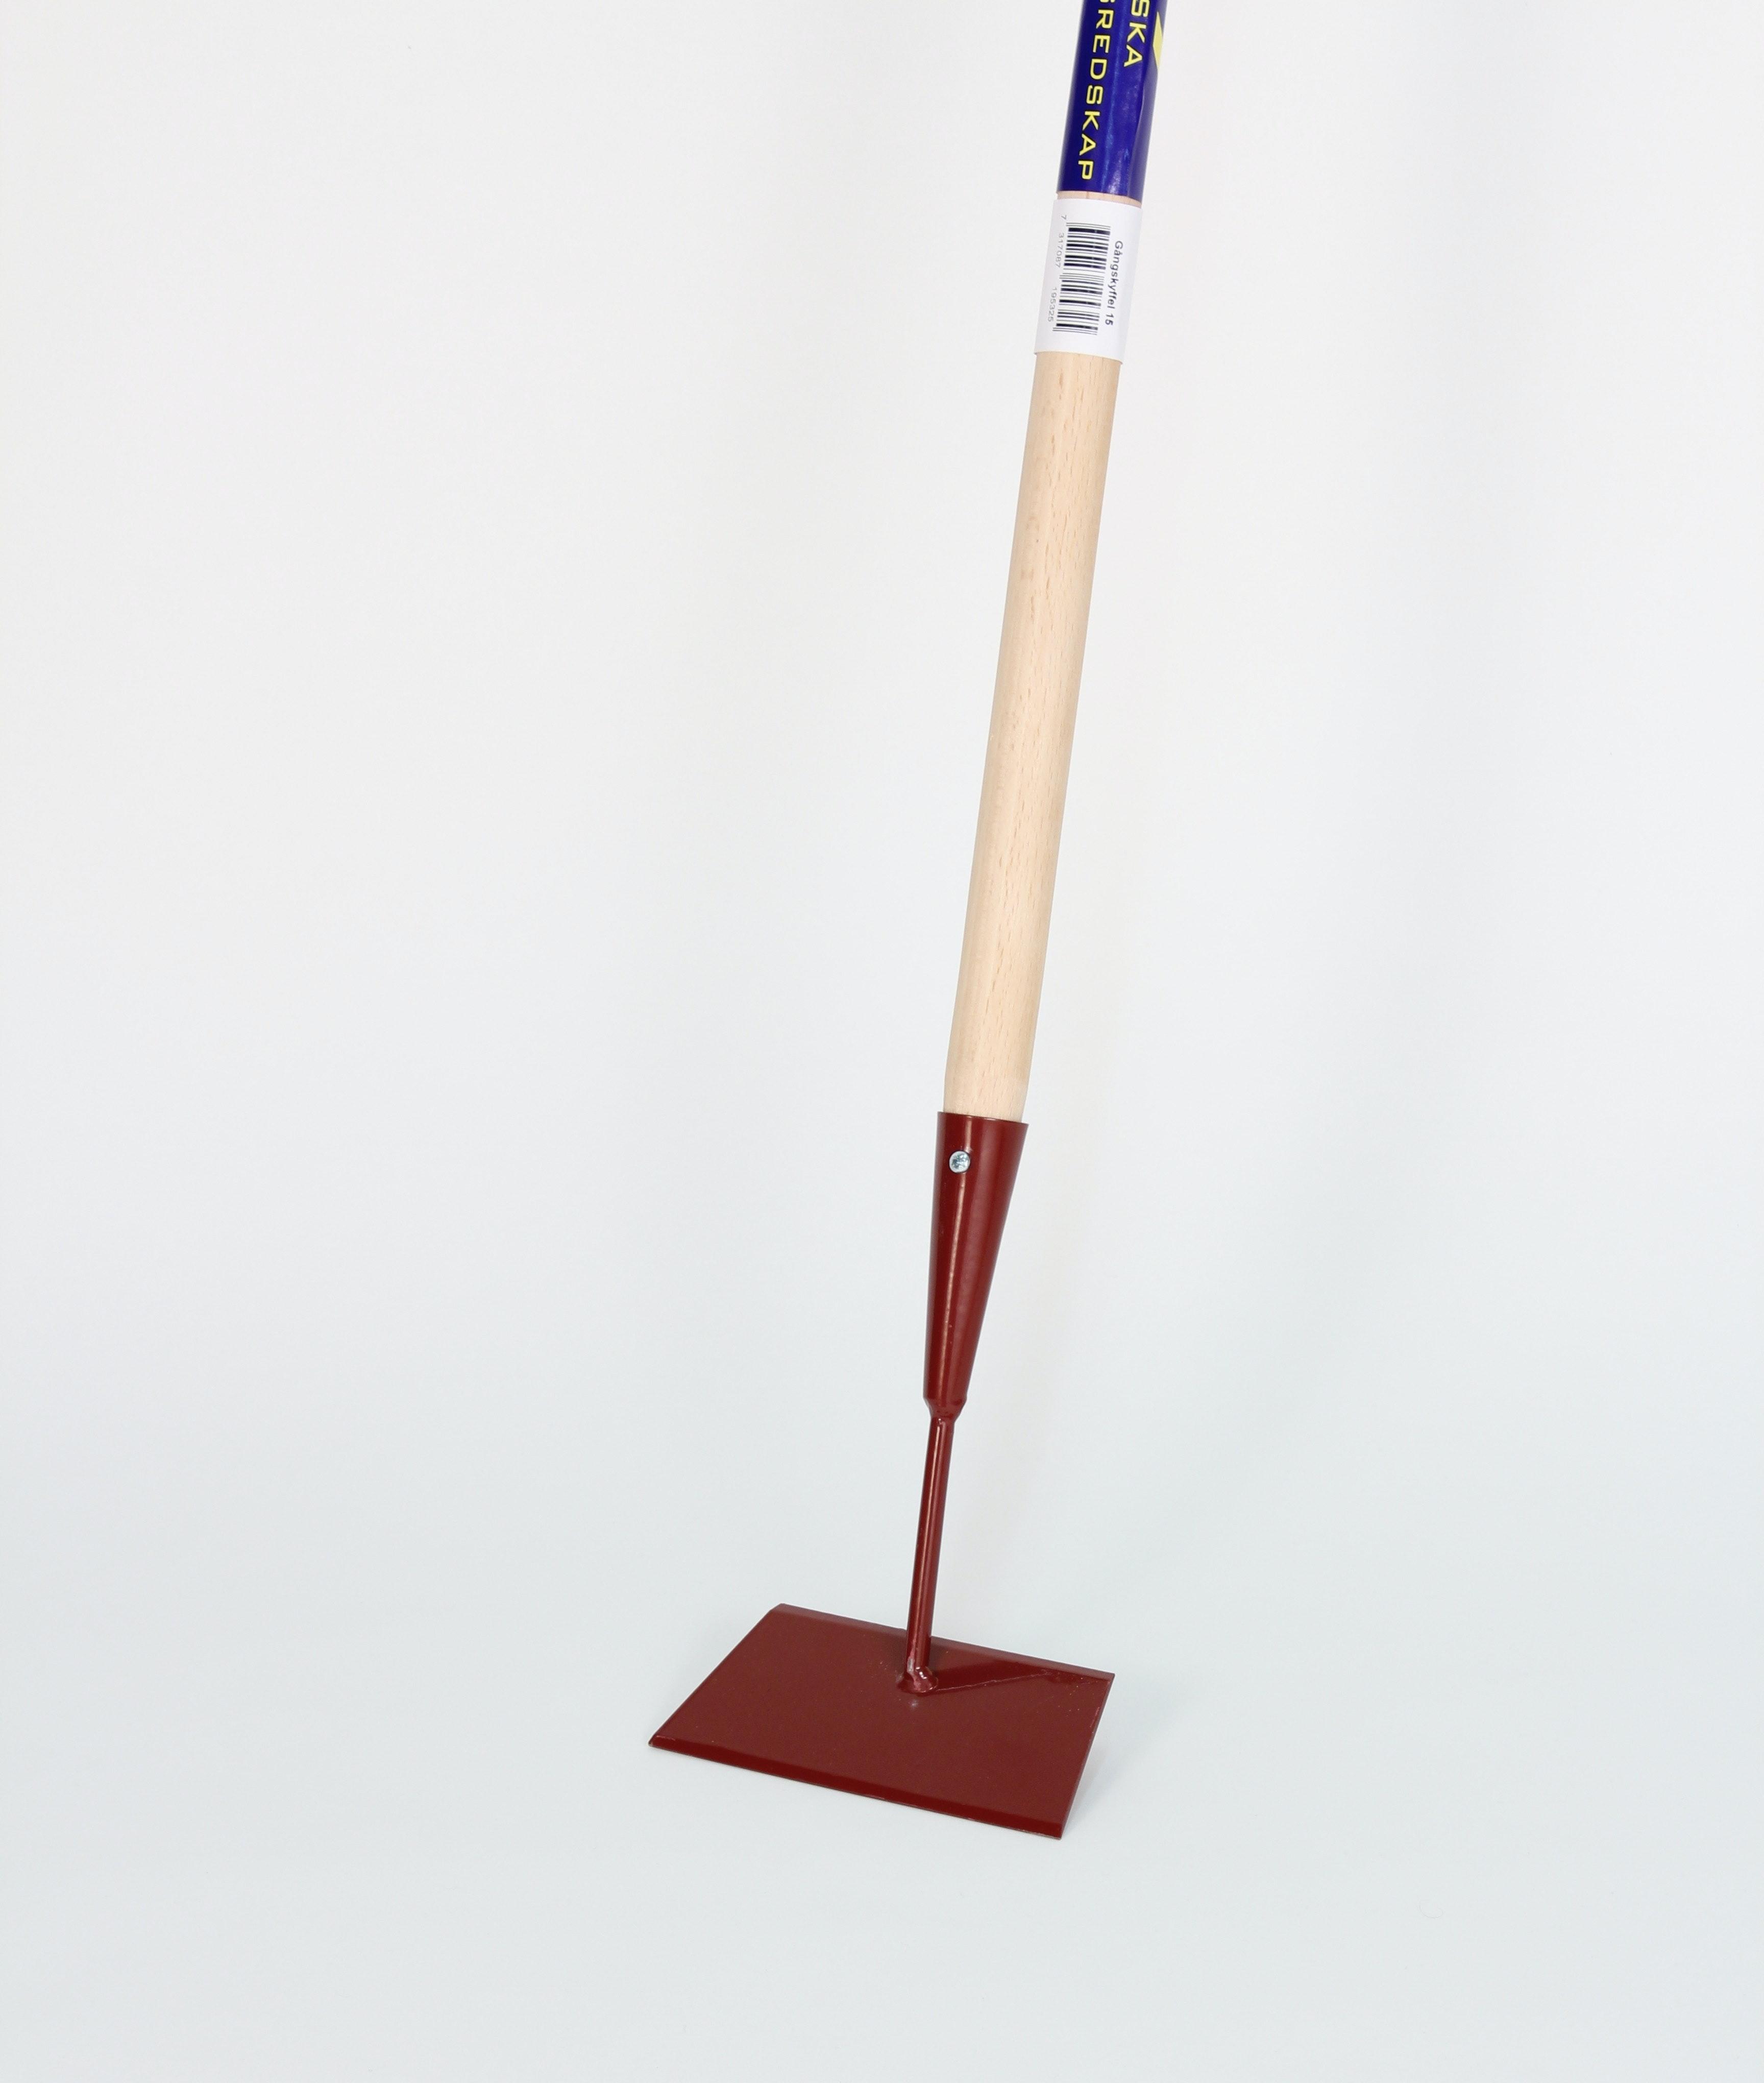 Gångskyffel Cofa Metall/Trä 135cm